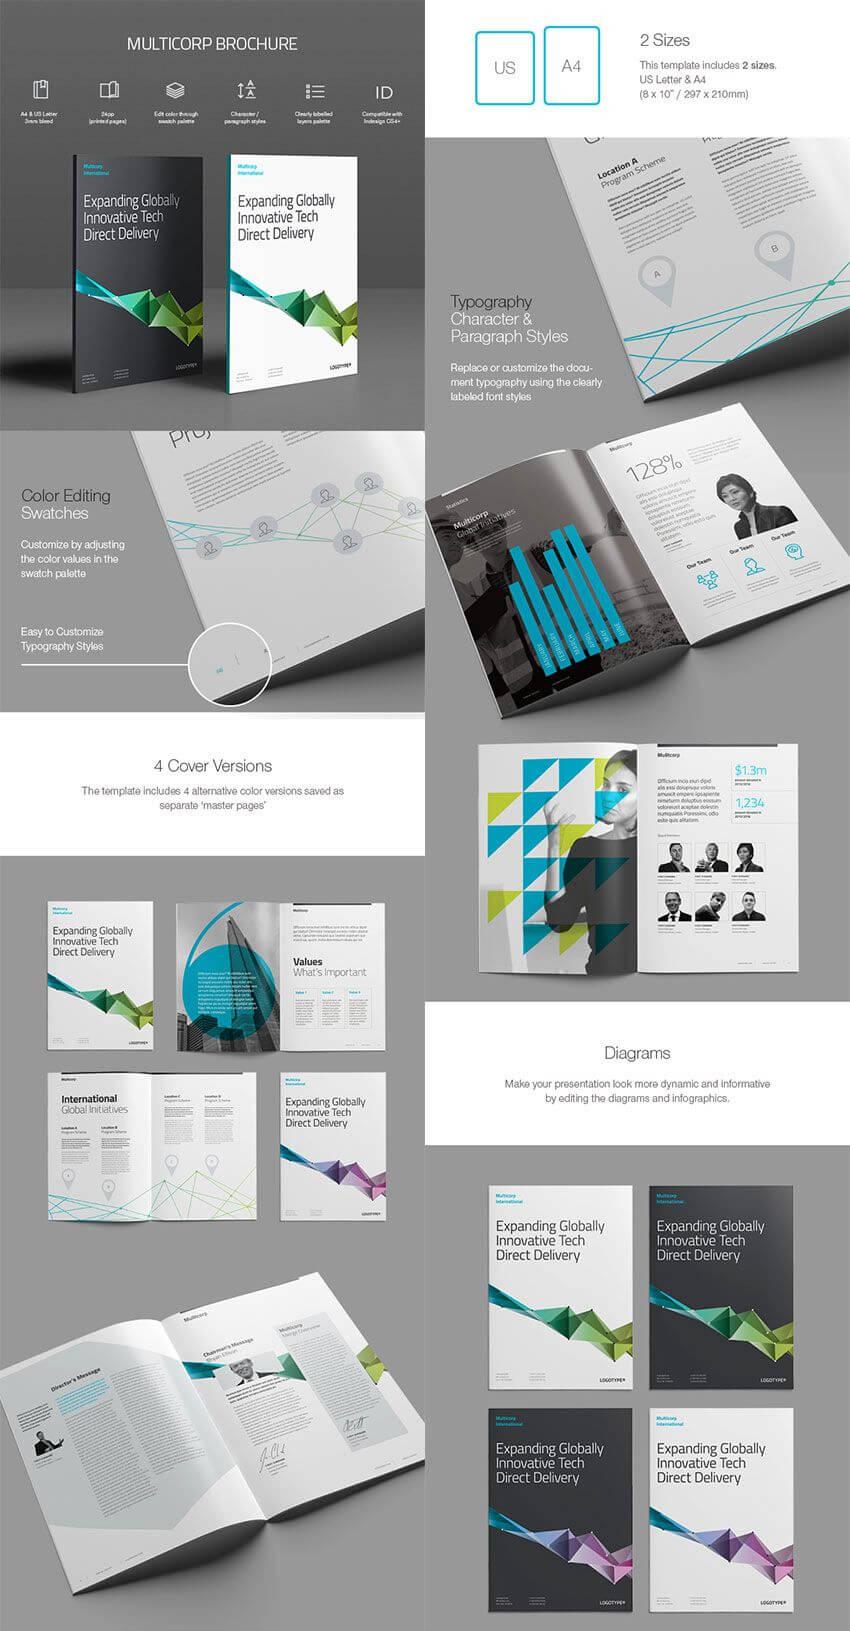 005 Indesign Brochure Template Free Stirring Ideas Corporate Regarding Adobe Indesign Brochure Templates